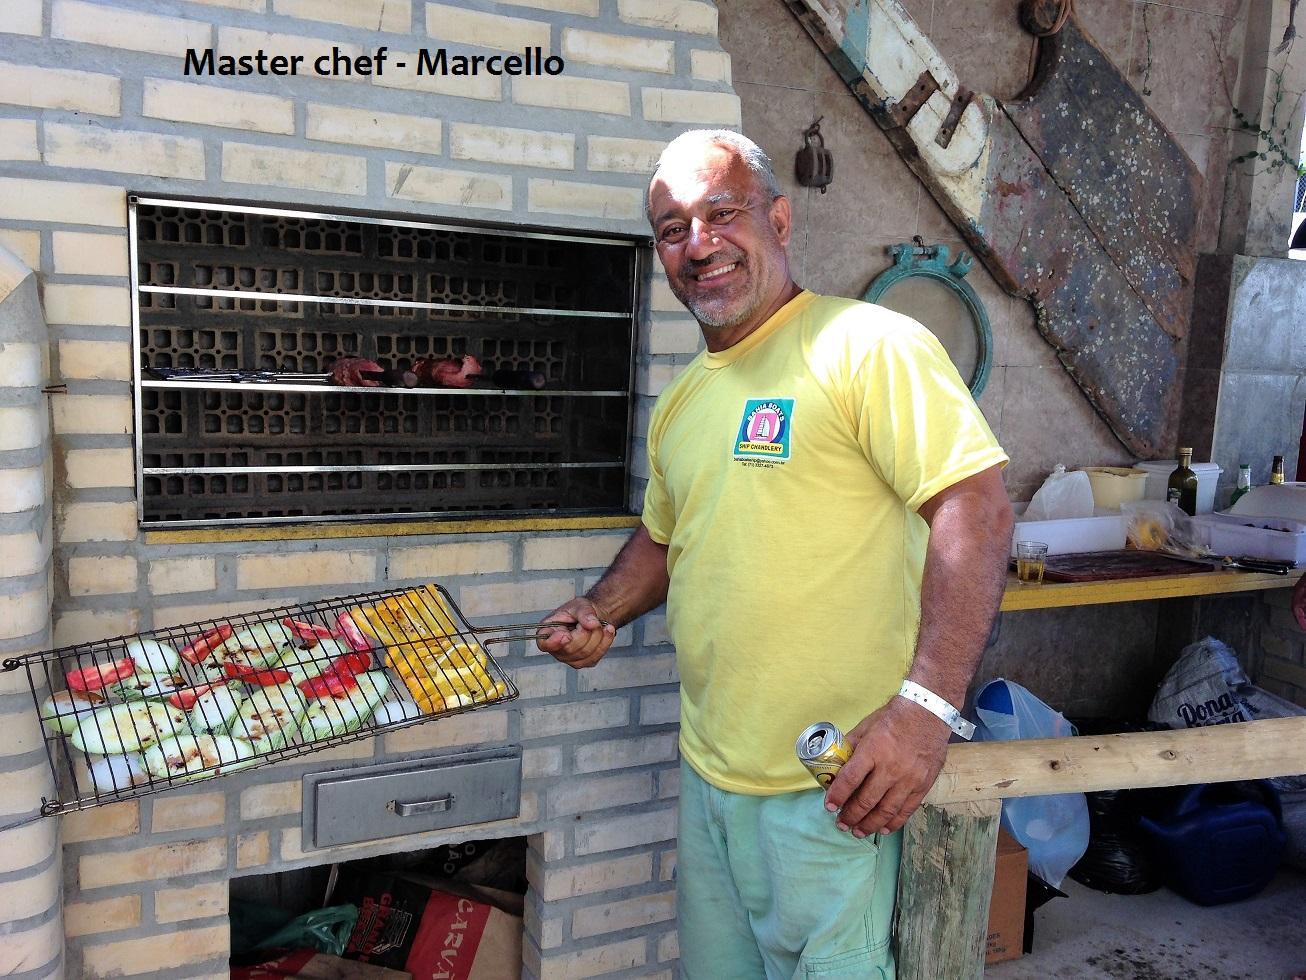 Marcello bbq.JPG